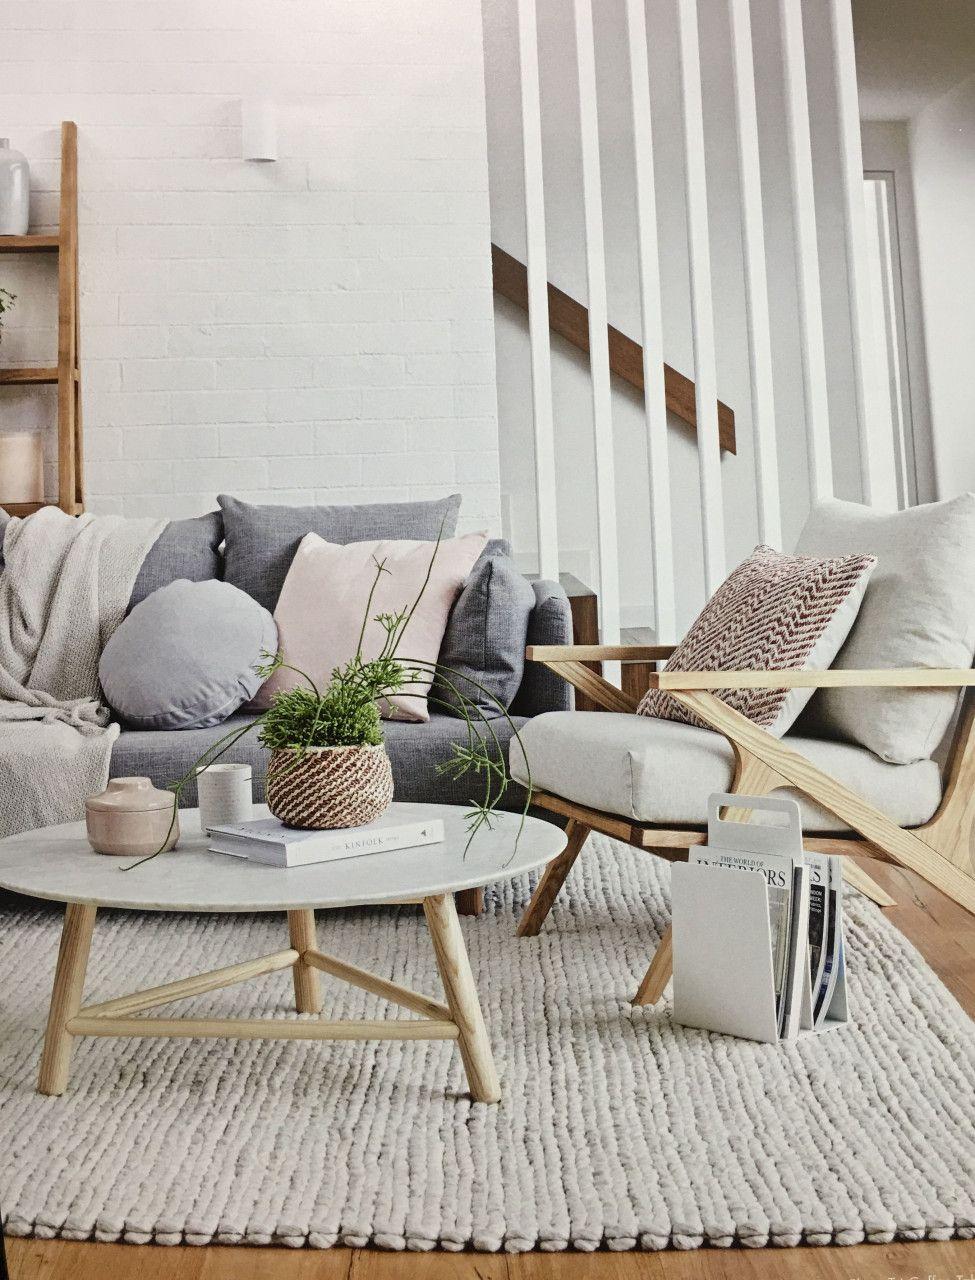 70 New Scandinavian Style Coffee Table 2020 Living Room Scandinavian Minimalist Living Room Scandinavian Design Living Room